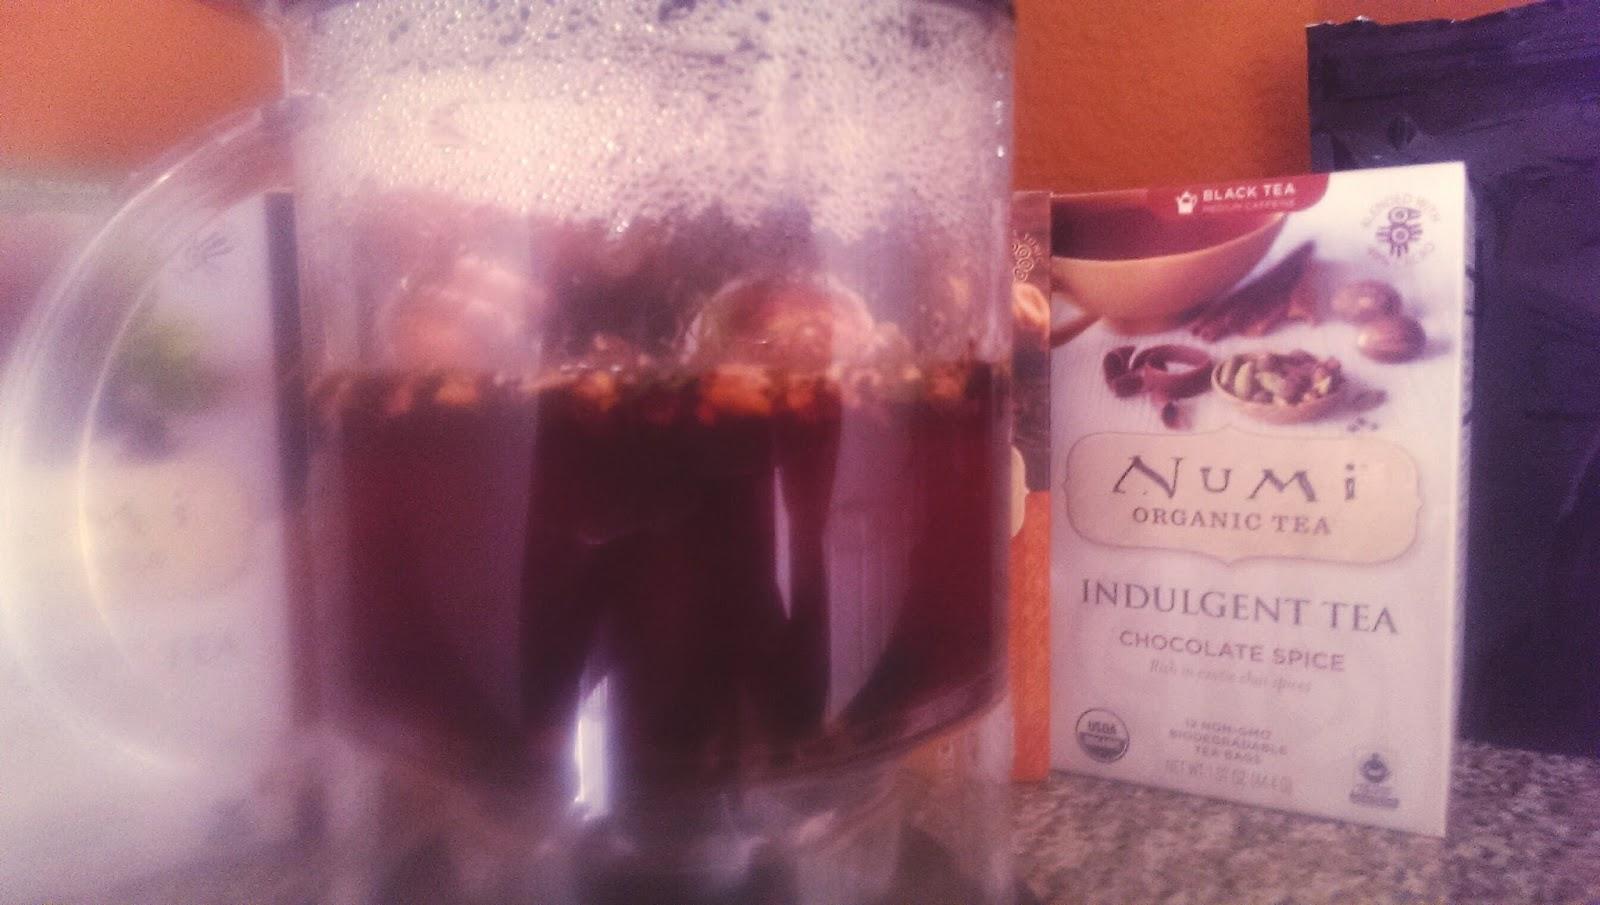 Justine Numi Organic Tea Recently Launched Justine's Blend Loose Leaf Tea